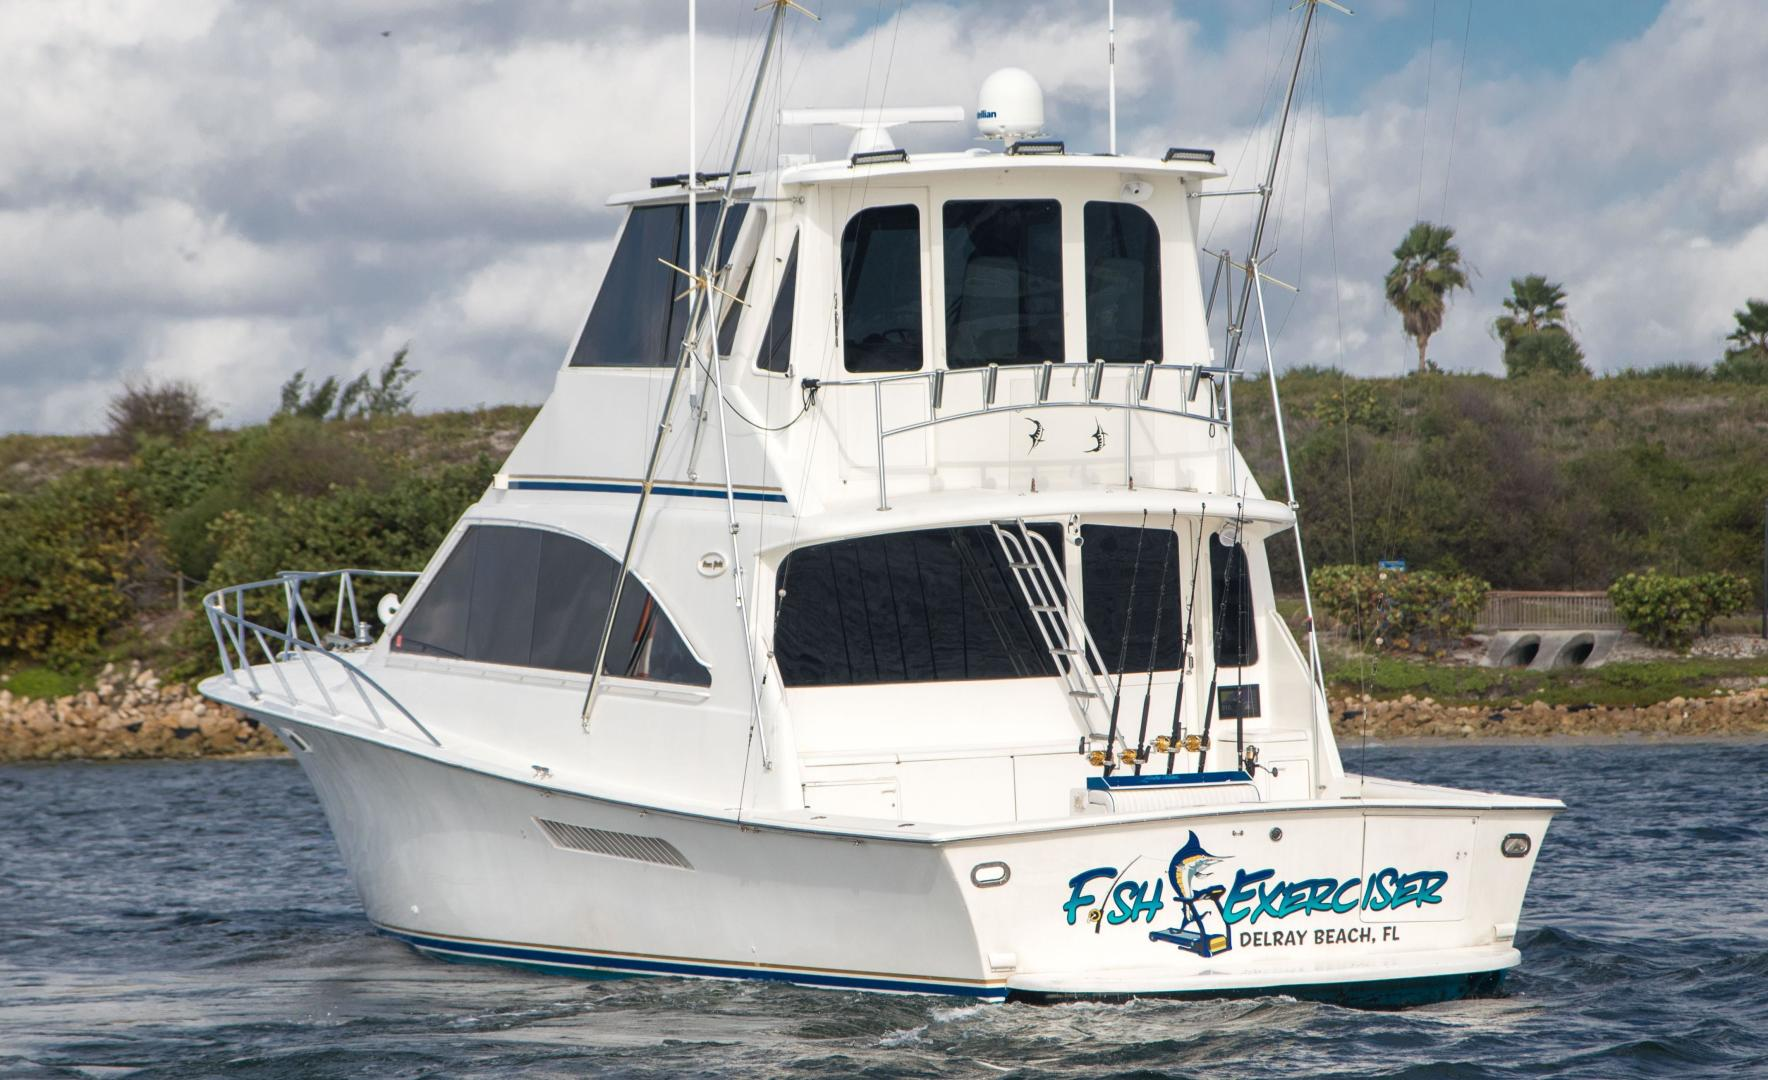 Ocean Yachts 2000-FISH EXERCISER Riviera Beach-Florida-United States-1552074 | Thumbnail